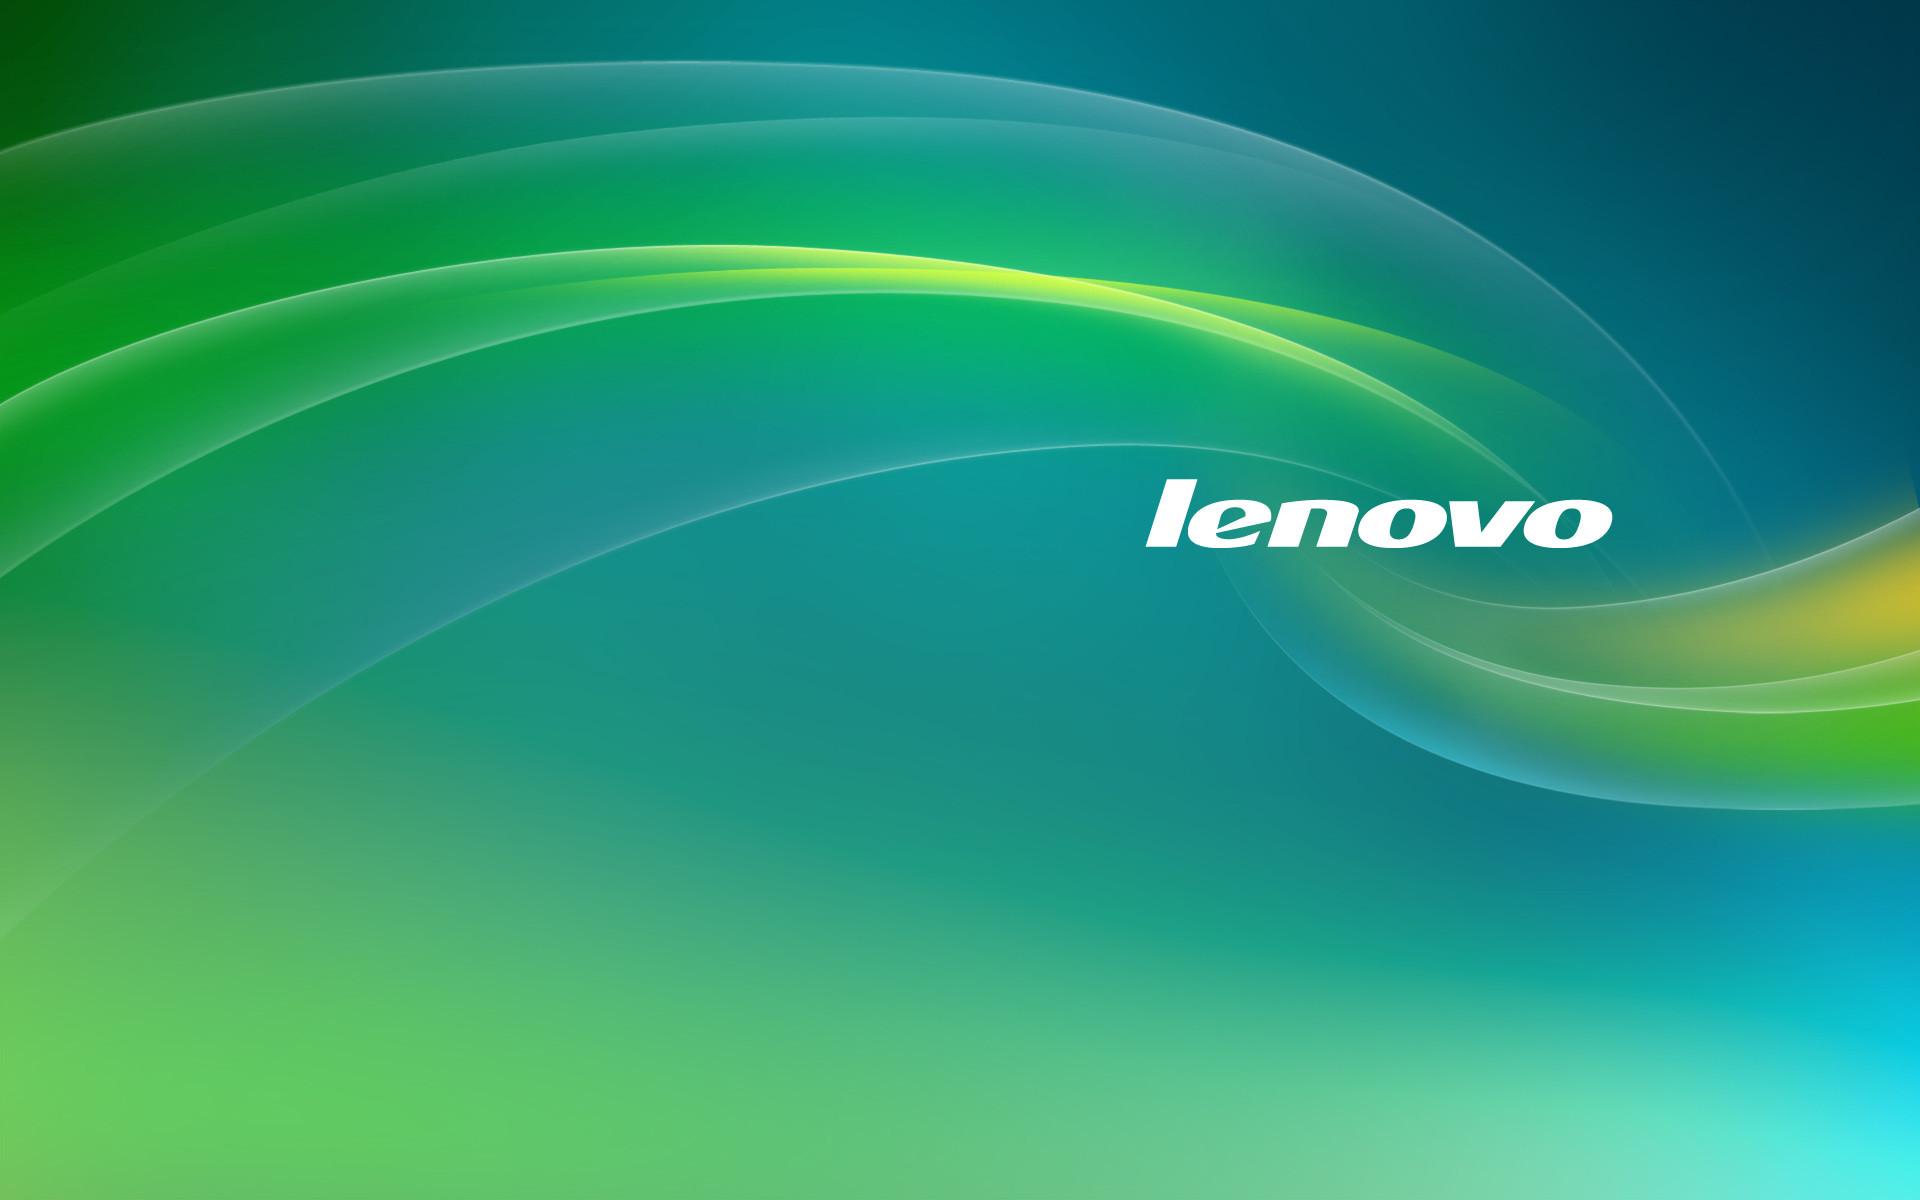 Lenovo Windows 10 Wallpaper (69+ images)